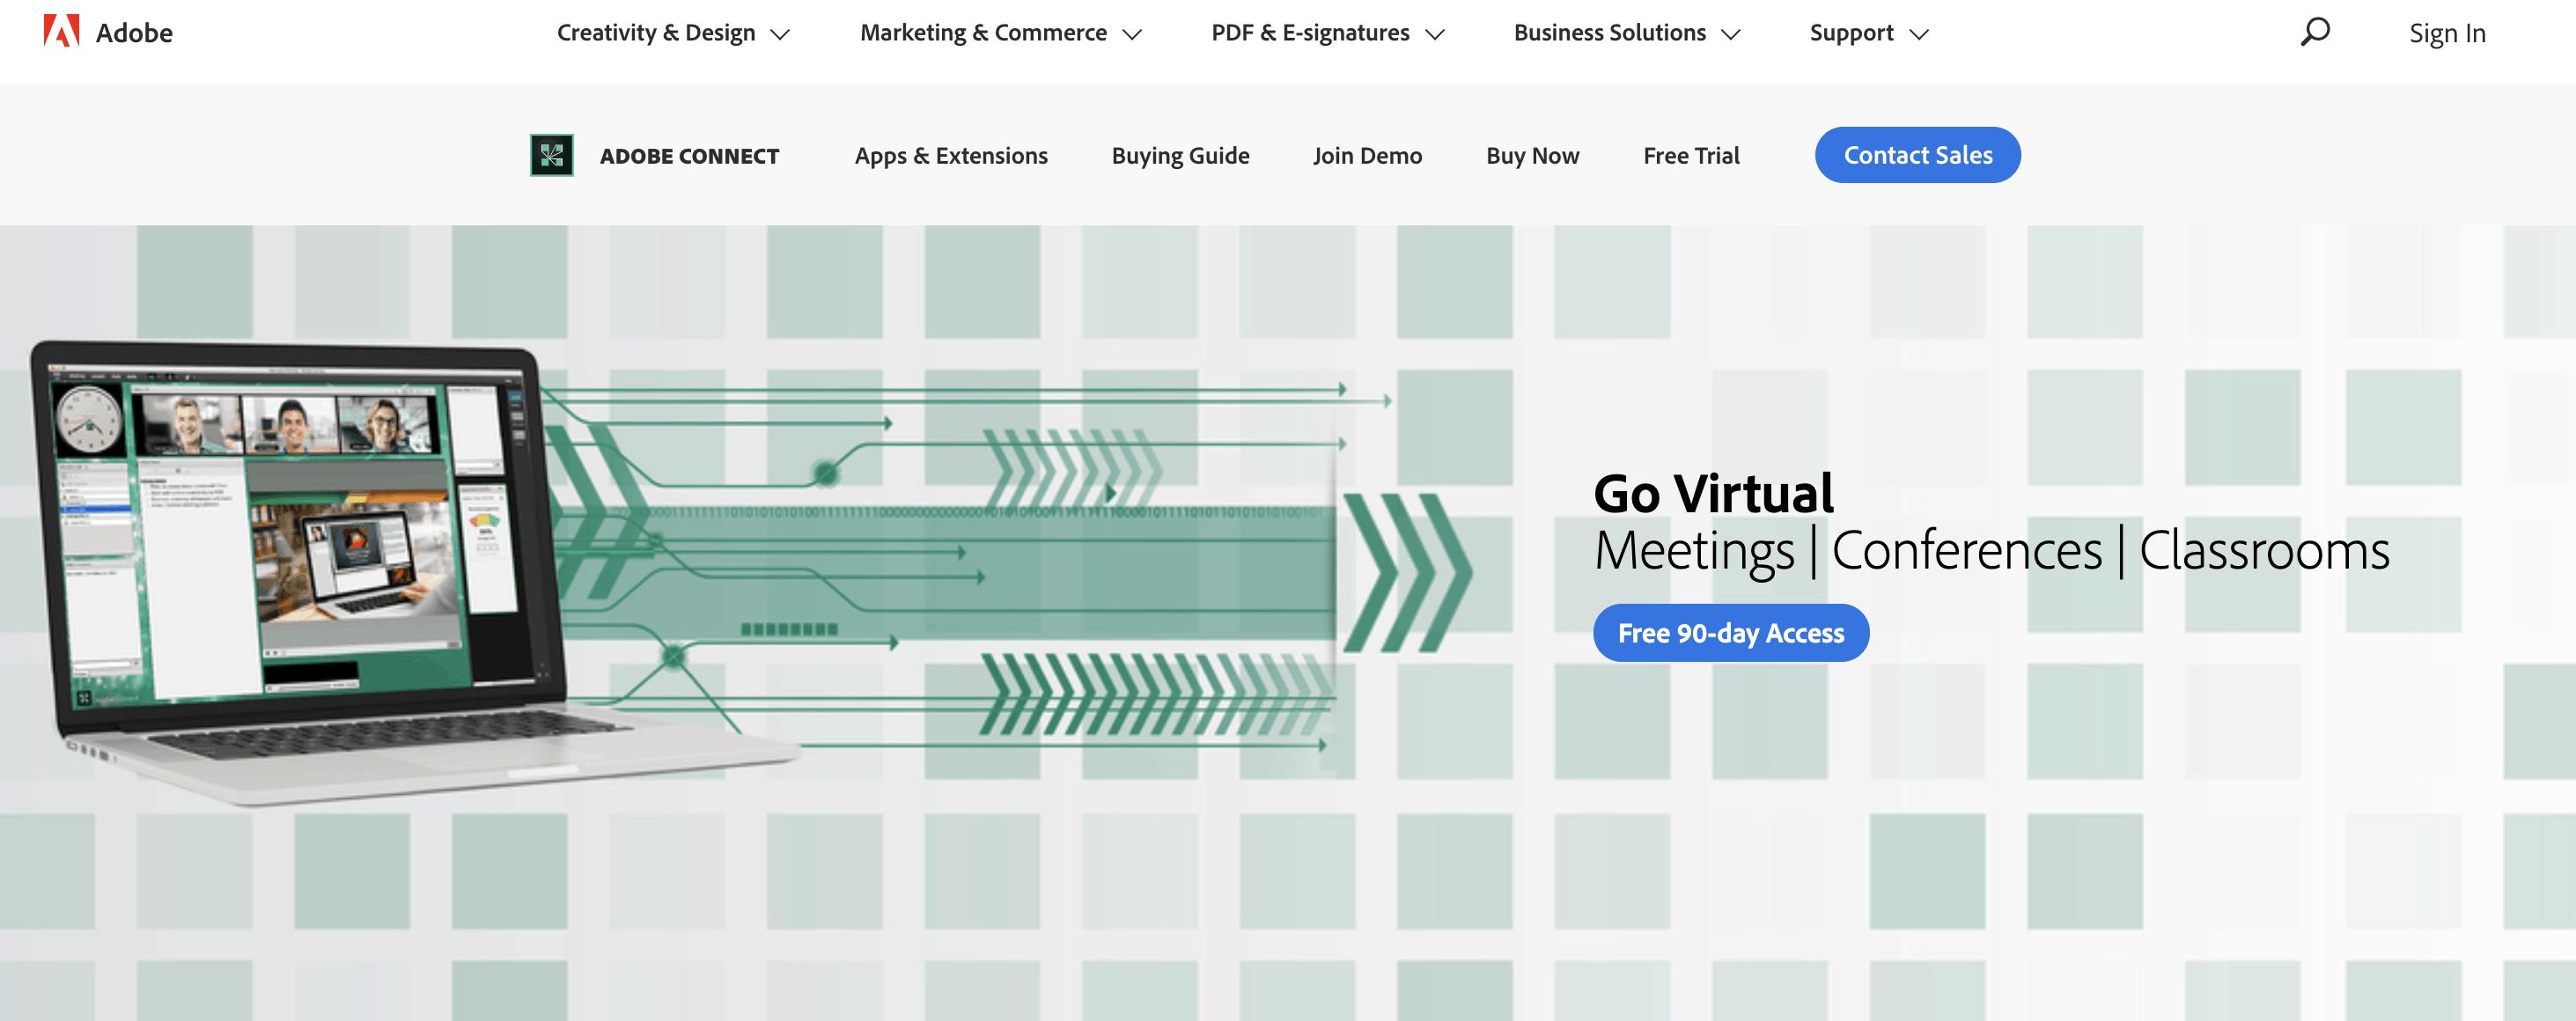 Adobe Connect platform